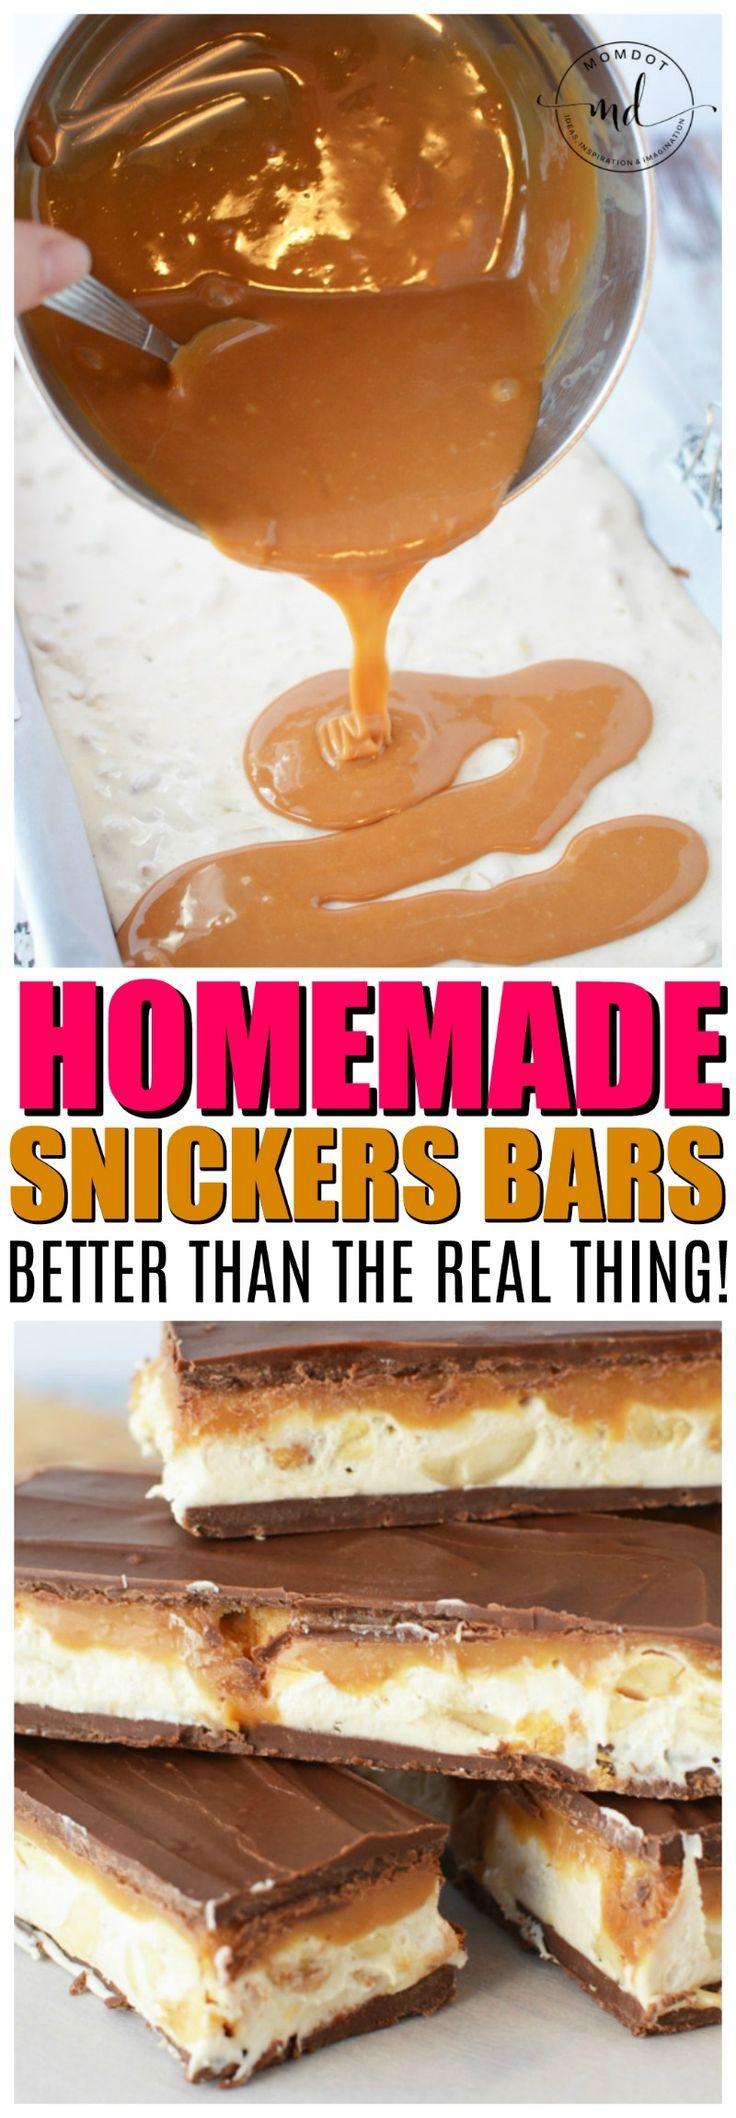 Homemade Snickers Bars Recipe, Decadent and Rich homemade candy bar recipe #snickers #candy #candybar #homemade  #dessert  #recipe #recipeoftheday